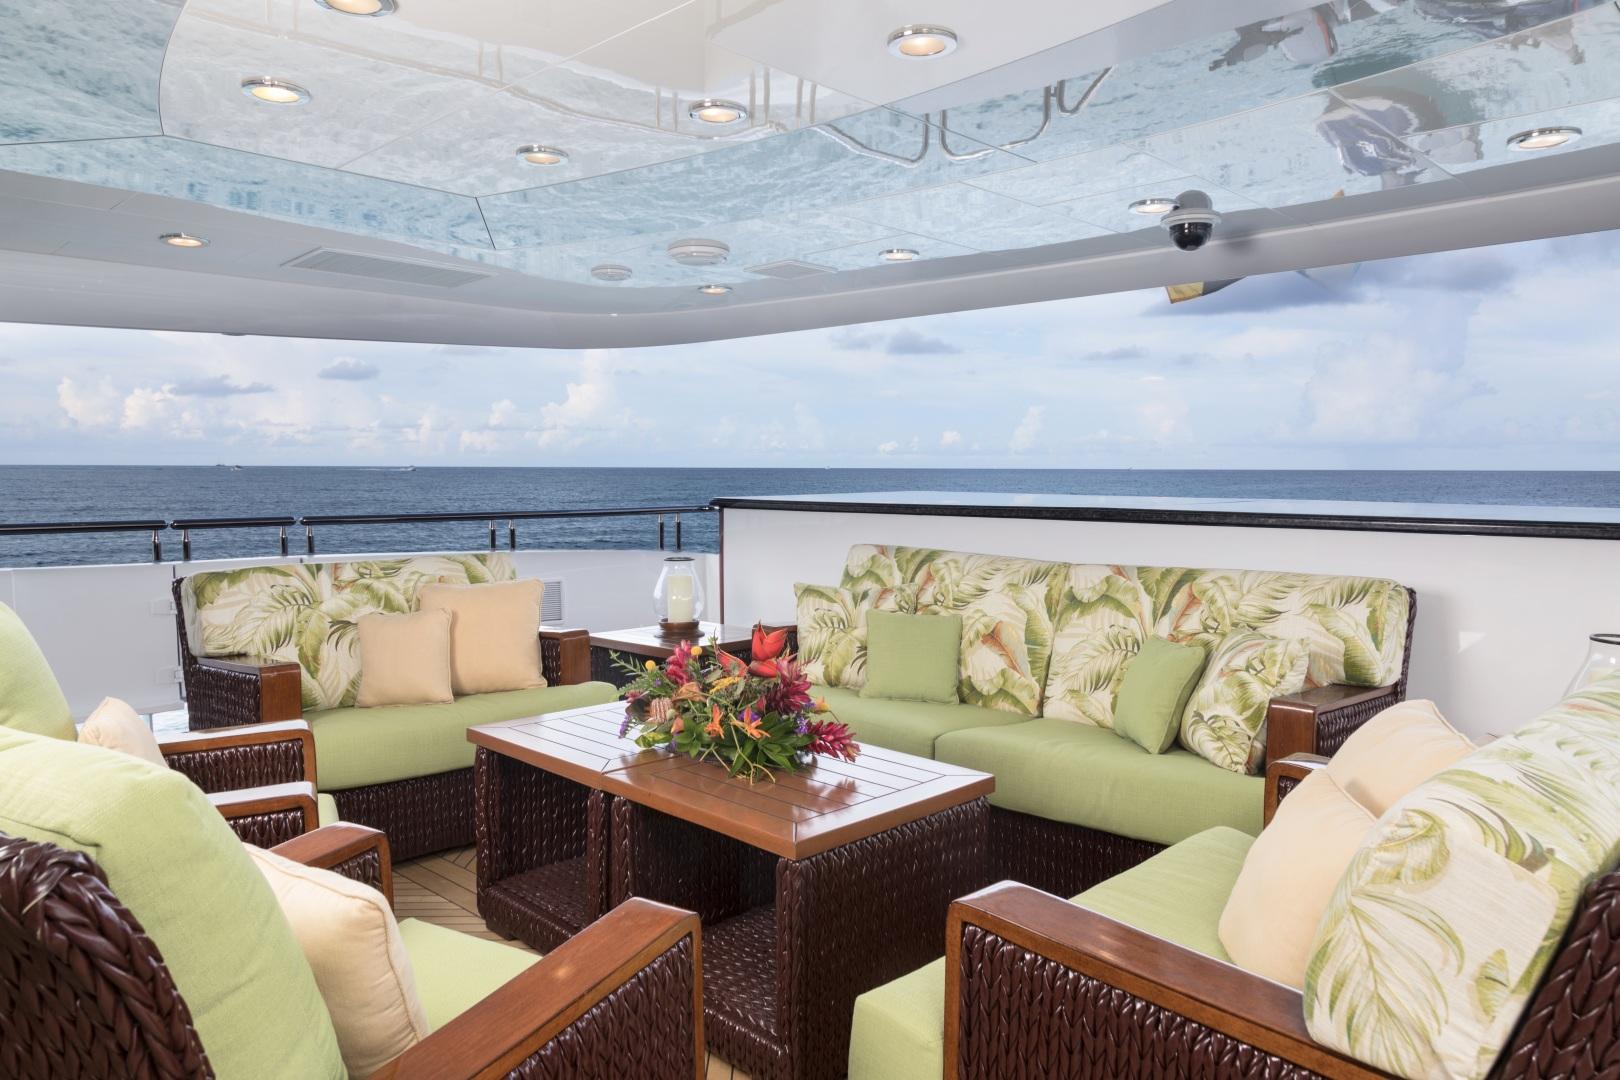 Trinity Yachts-164 Tri-deck Motor Yacht 2008-Amarula Sun Fort Lauderdale-Florida-United States-Aft Deck-1513896 | Thumbnail